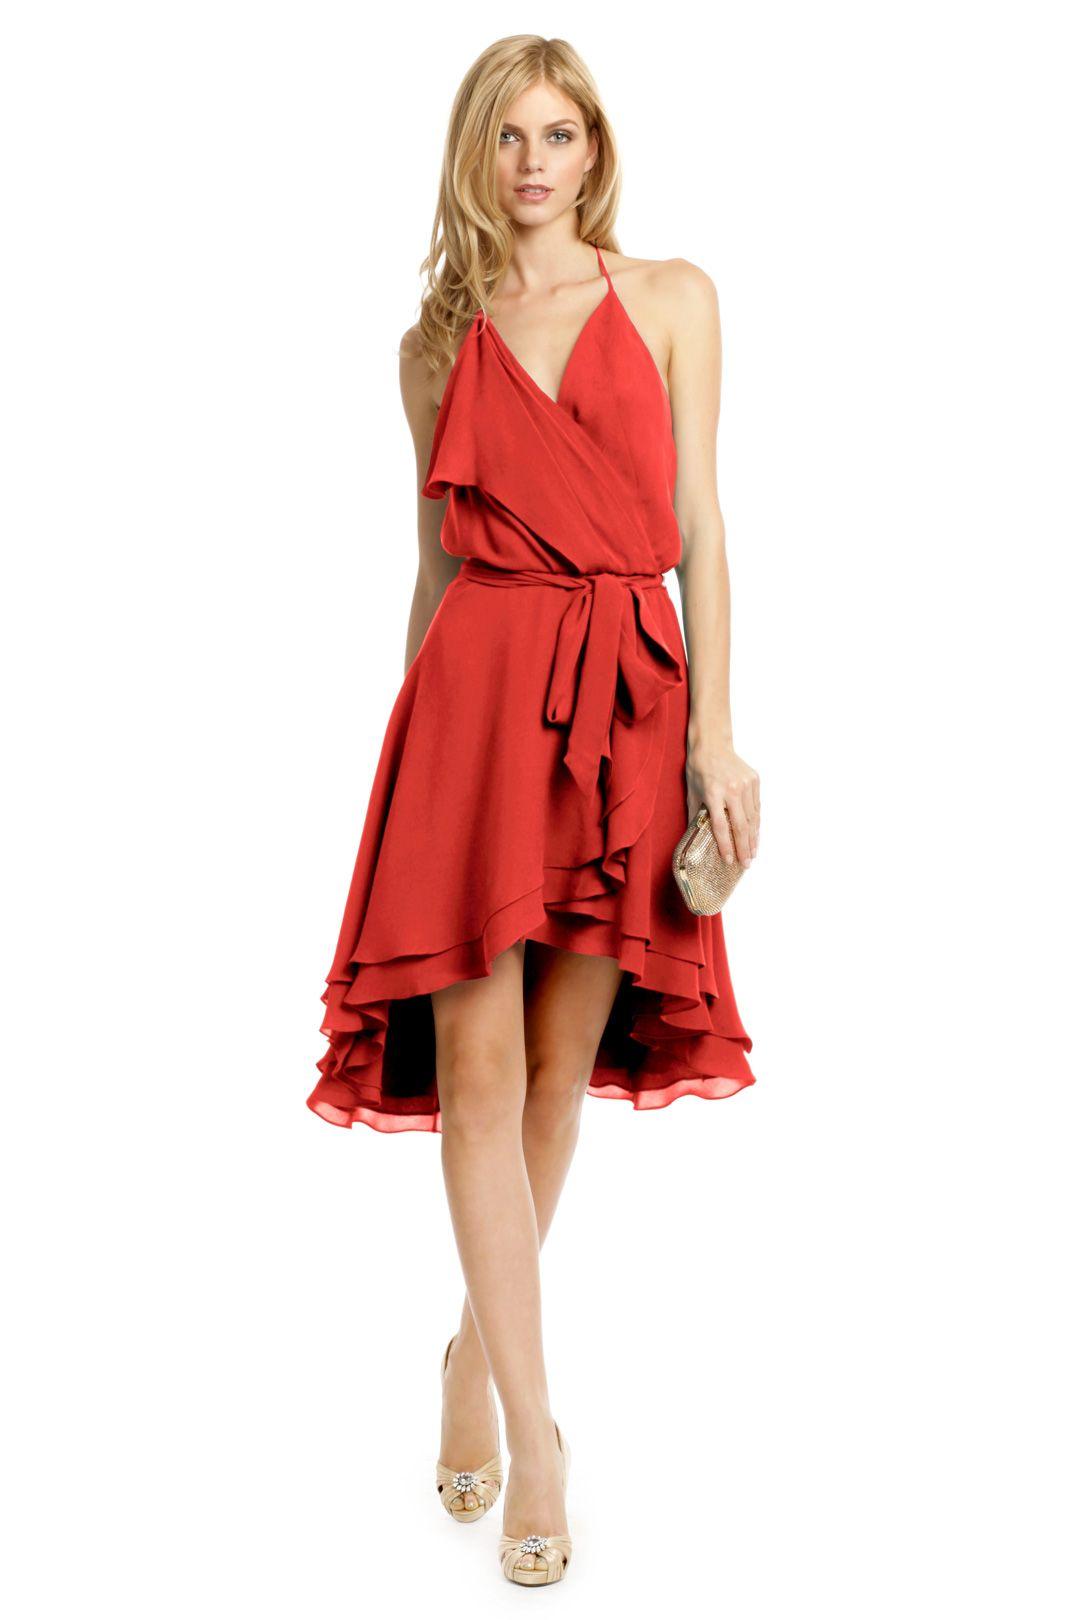 a414517809c Haute Hippie Salsa Dance Dress Havana Dance dress-only in pastel color